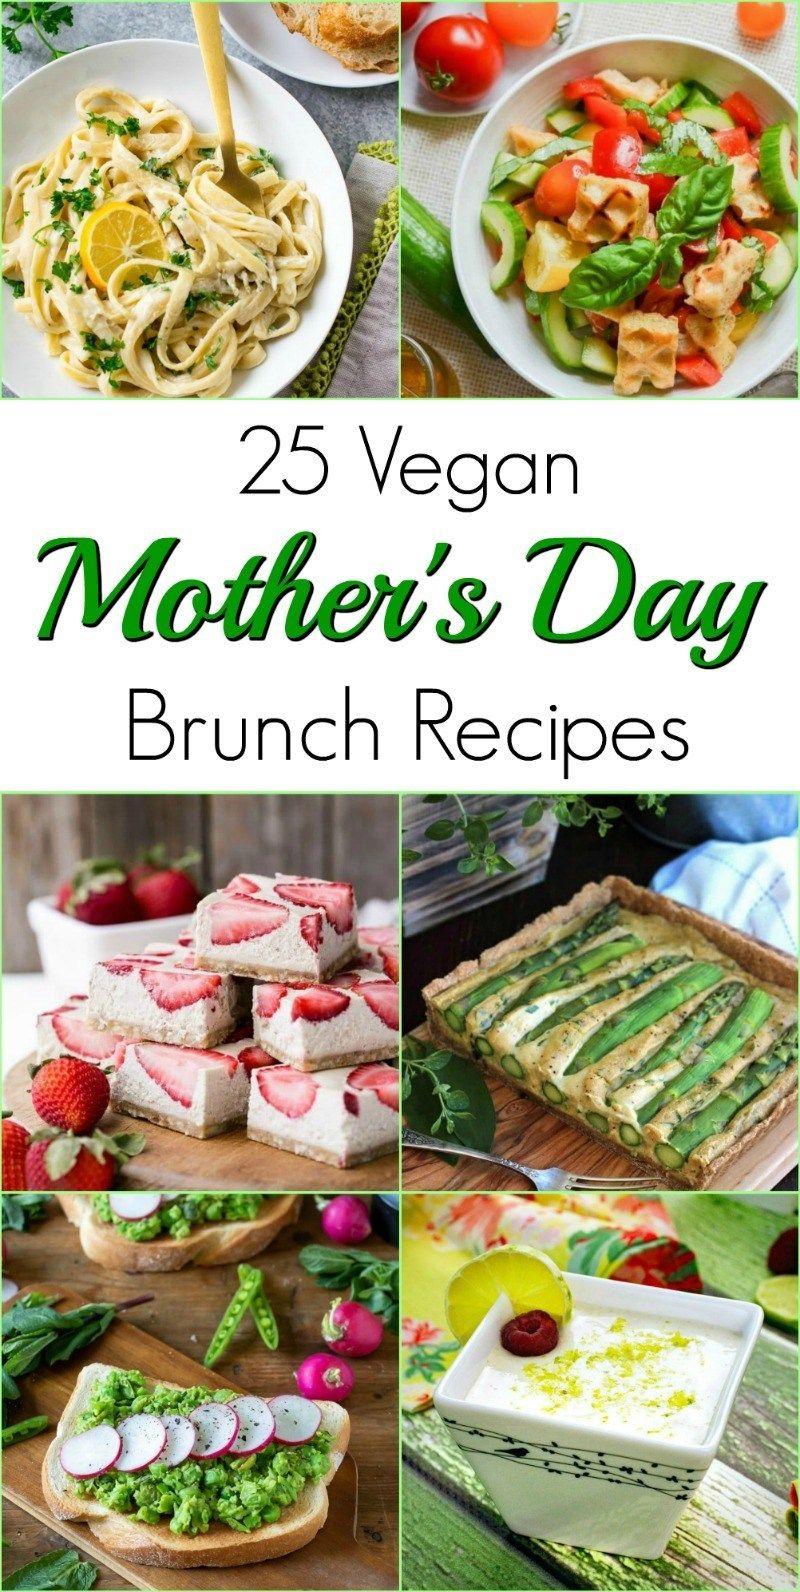 25 Vegan Mother S Day Brunch Recipes Vegan Brunch Recipes Brunch Recipes Easy Brunch Recipes